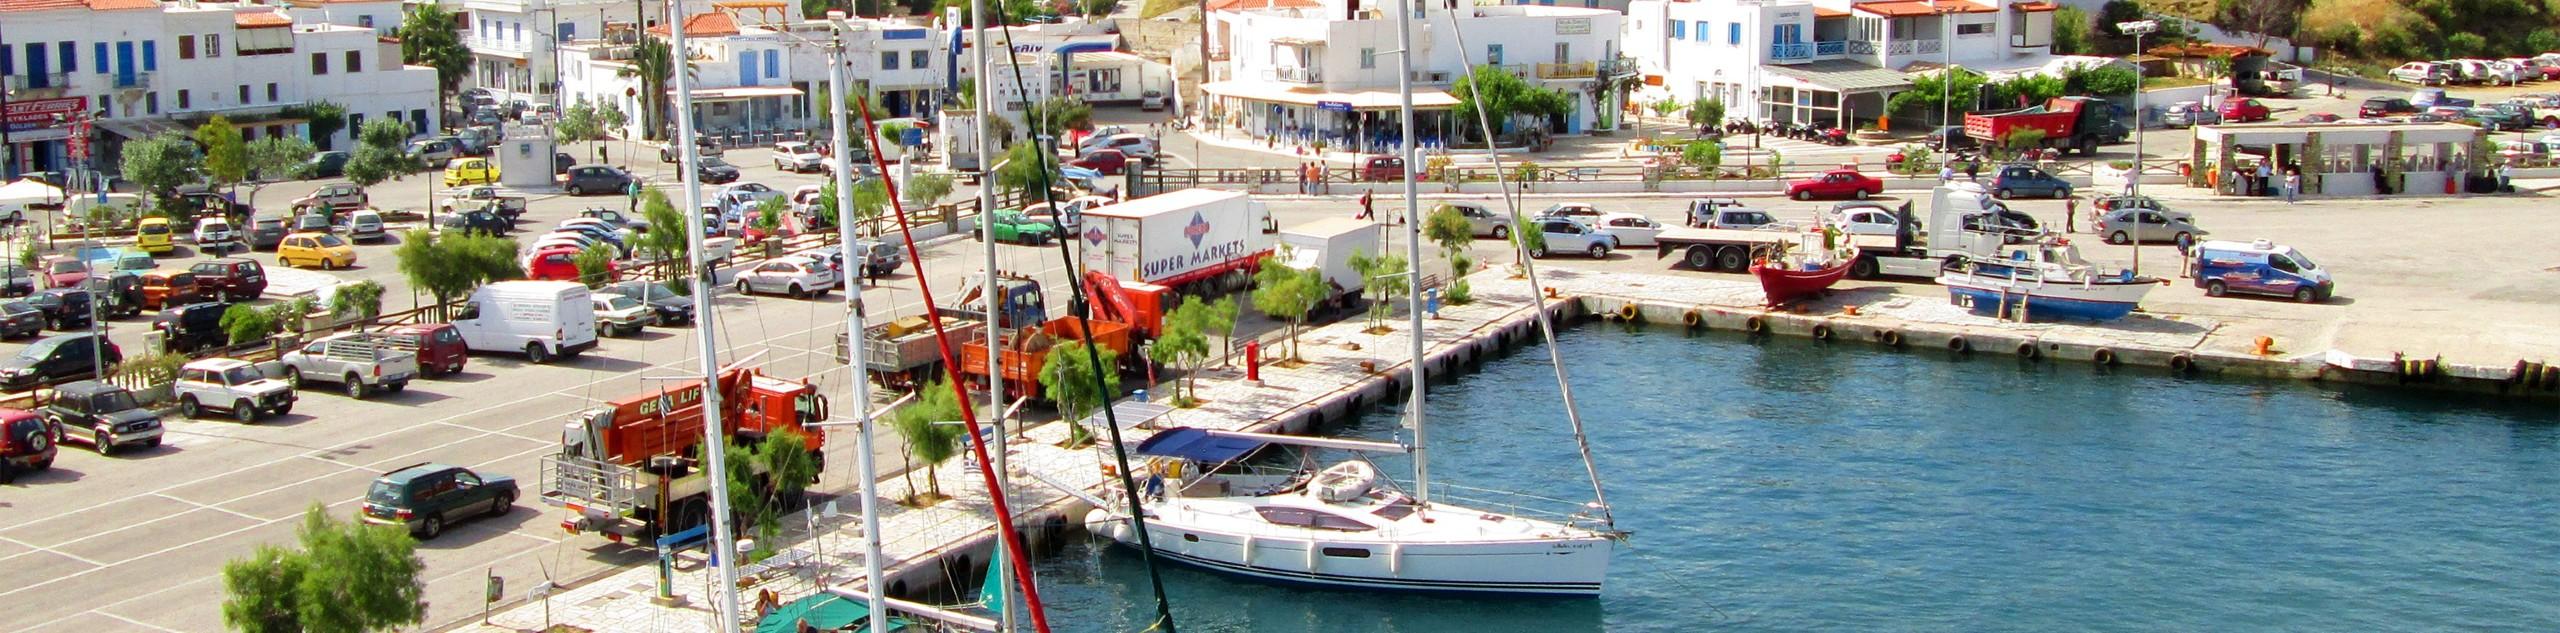 Beautiful marina in Andros